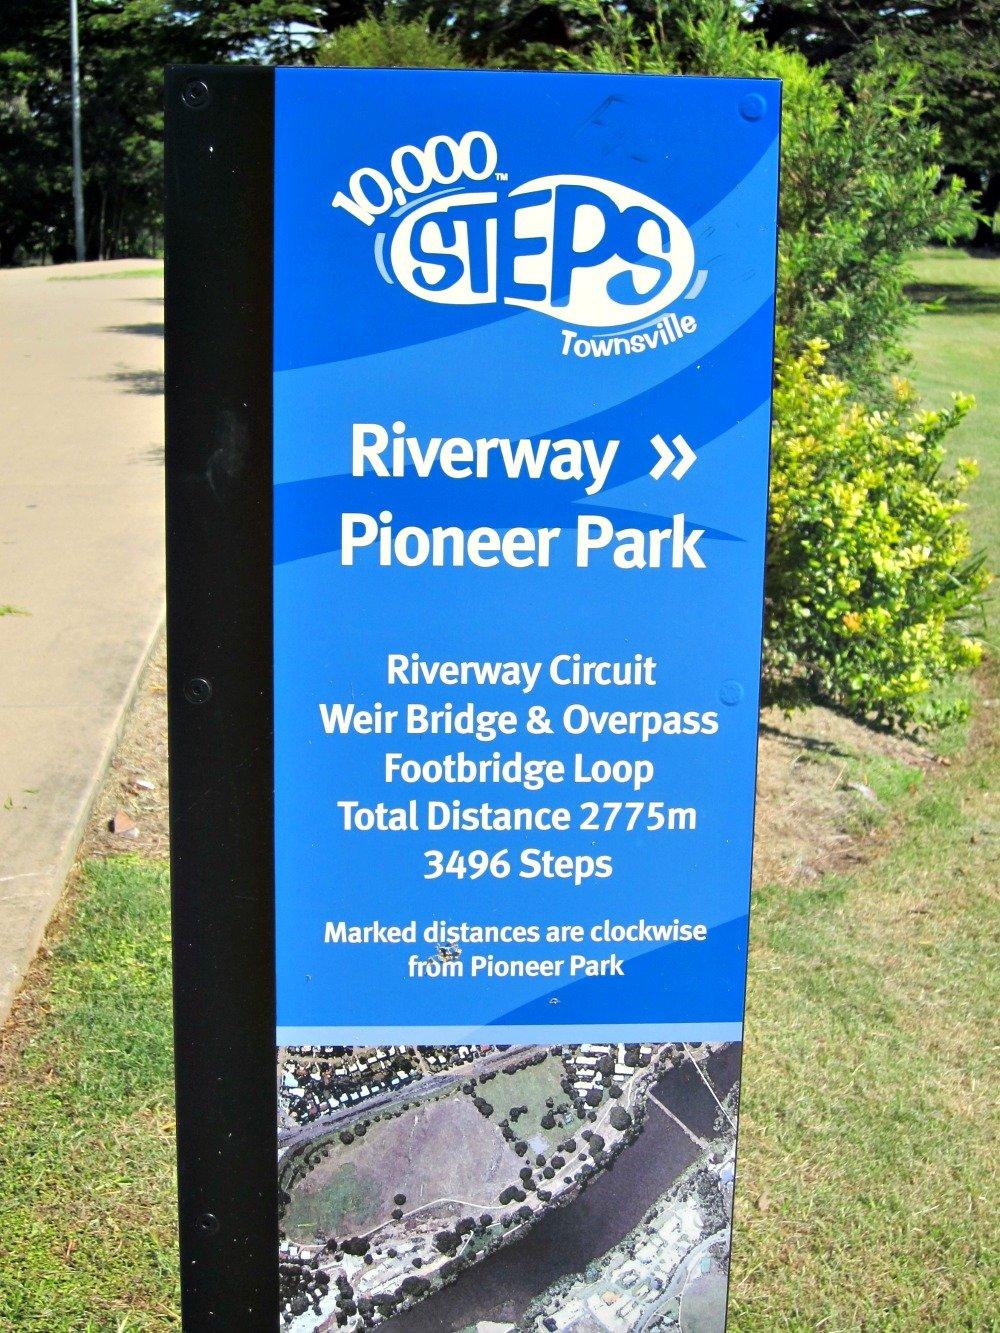 Riverway Circuit